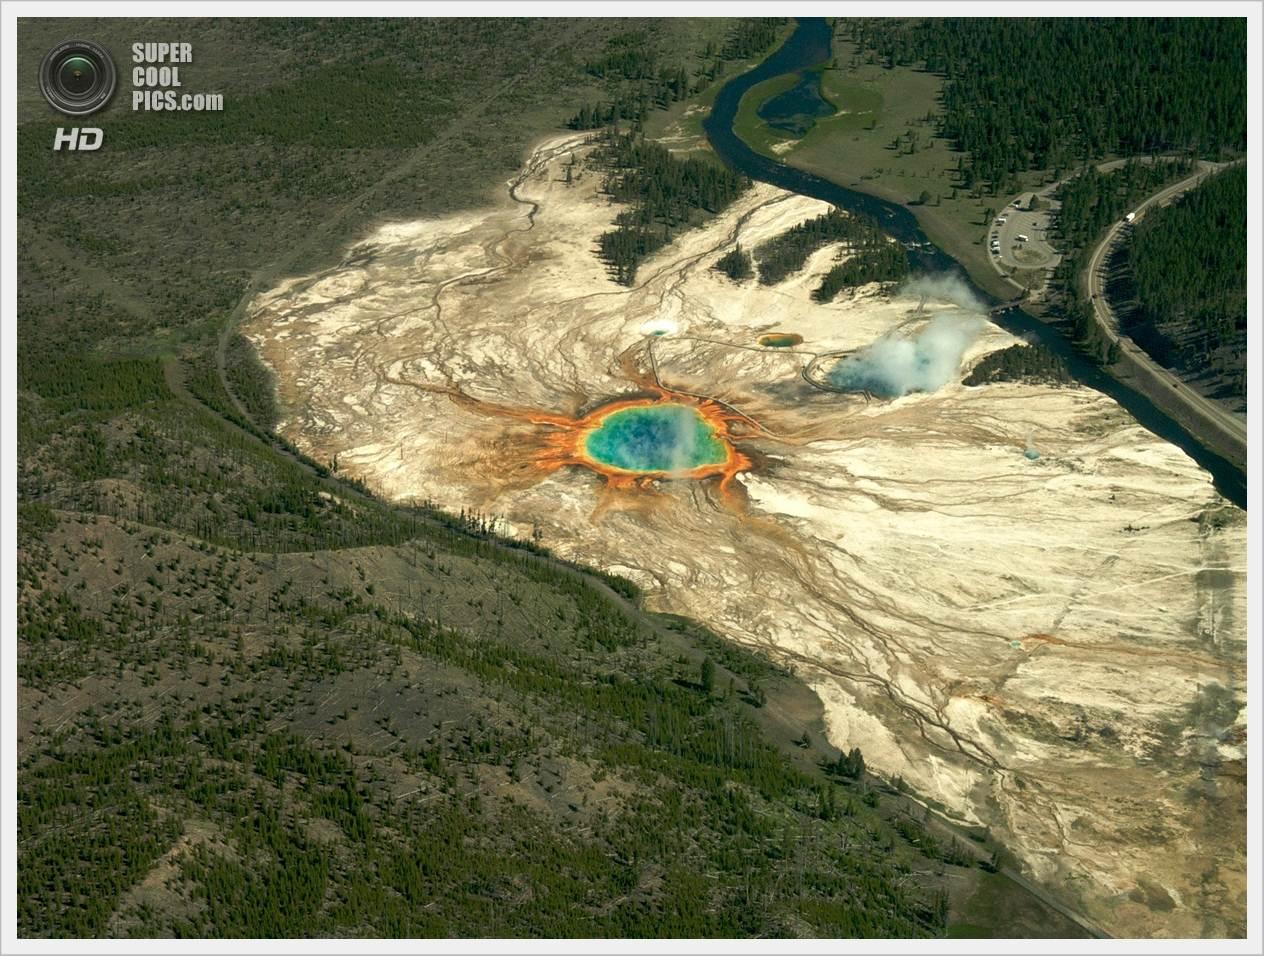 вас обрызгали йеллоустонский вулкан отчет времини думал